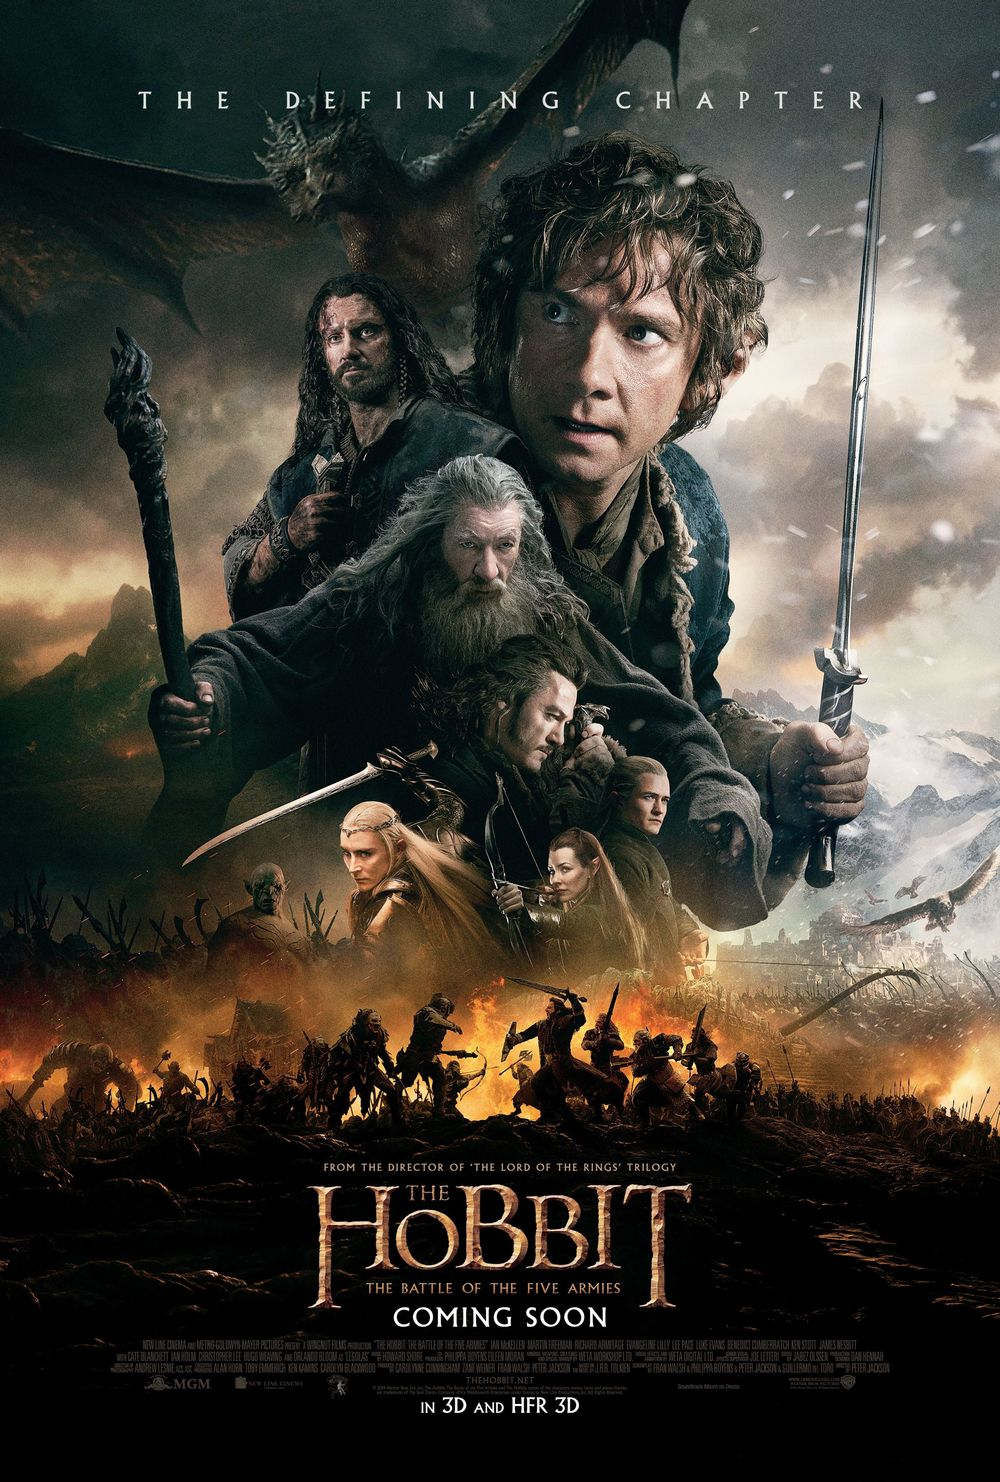 Hobbit_BOTFA_Intl_poster.jpg